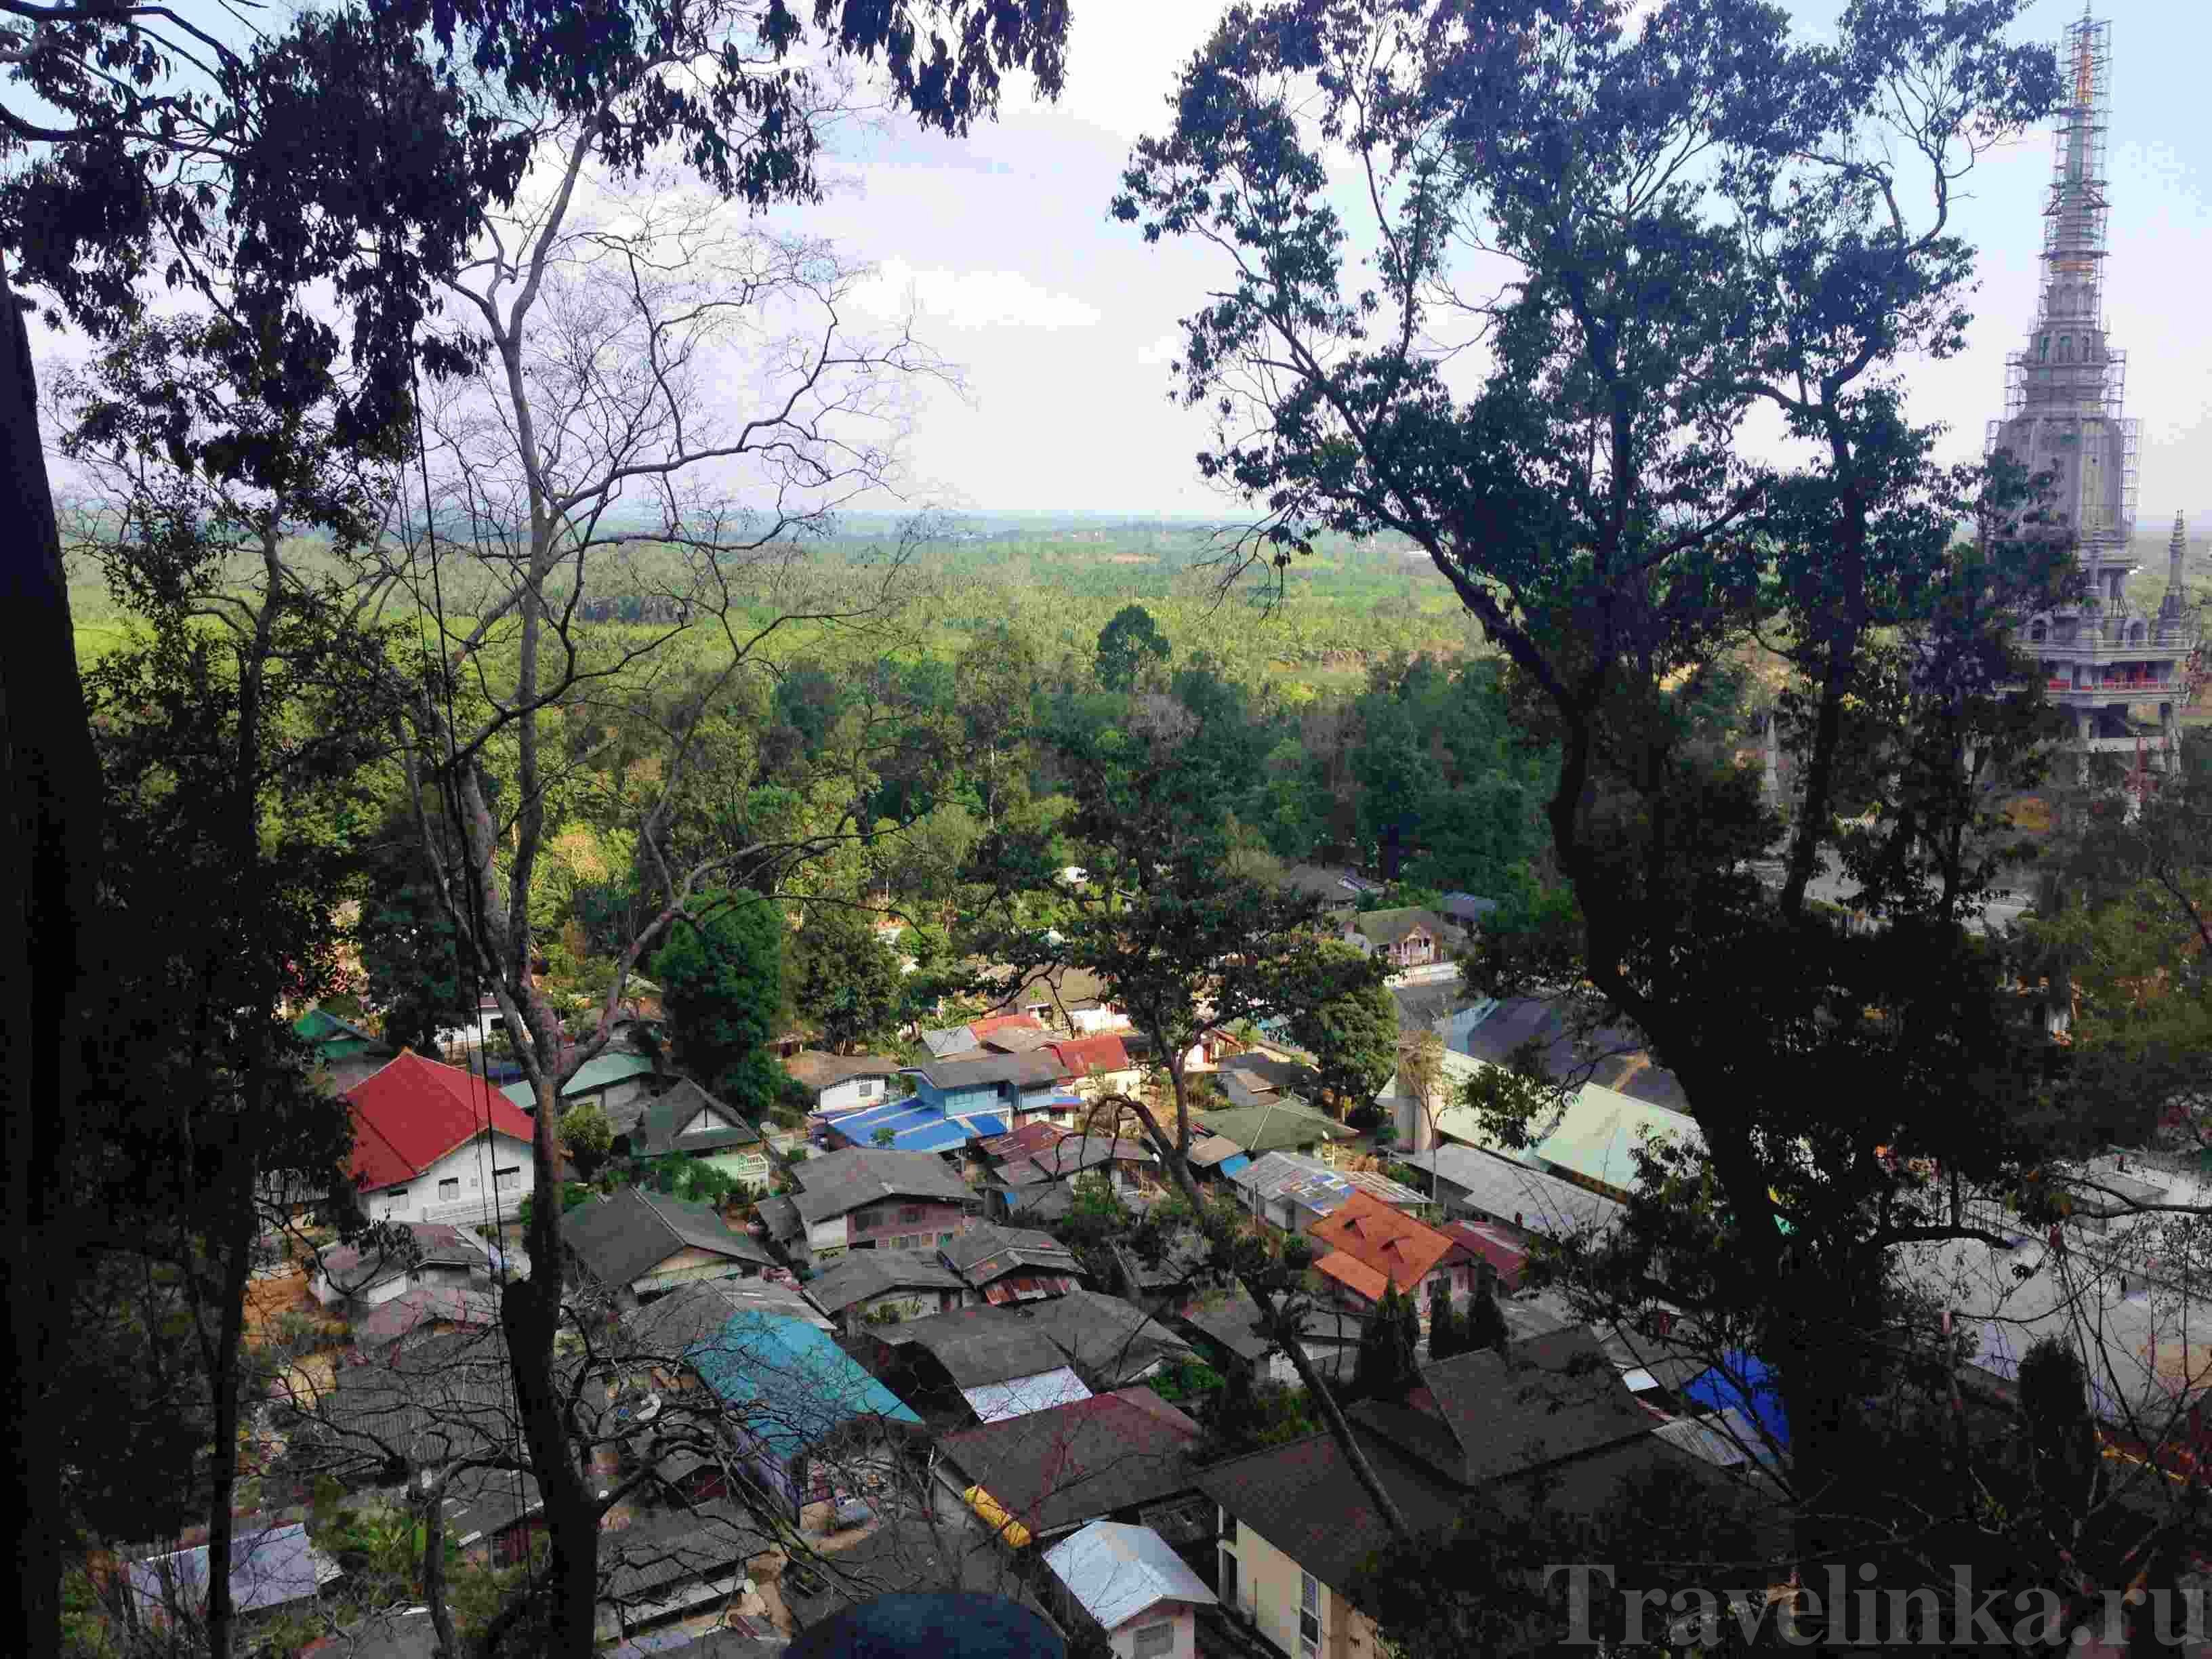 Hram tigra hram tigrinoy peschery krabi thailand (13)